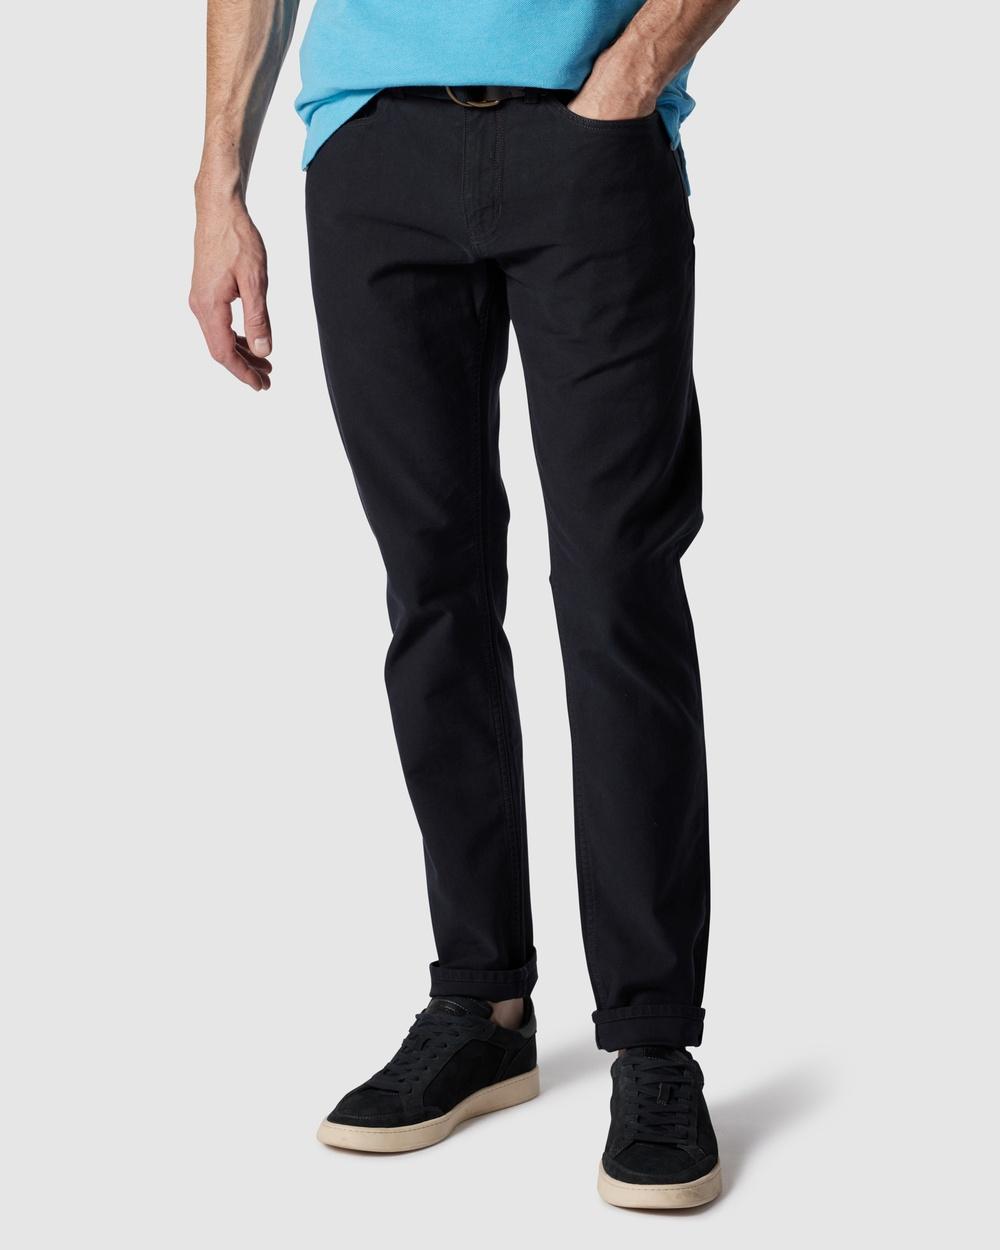 Rodd & Gunn Motion 2 Straight Jeans S Navy Australia